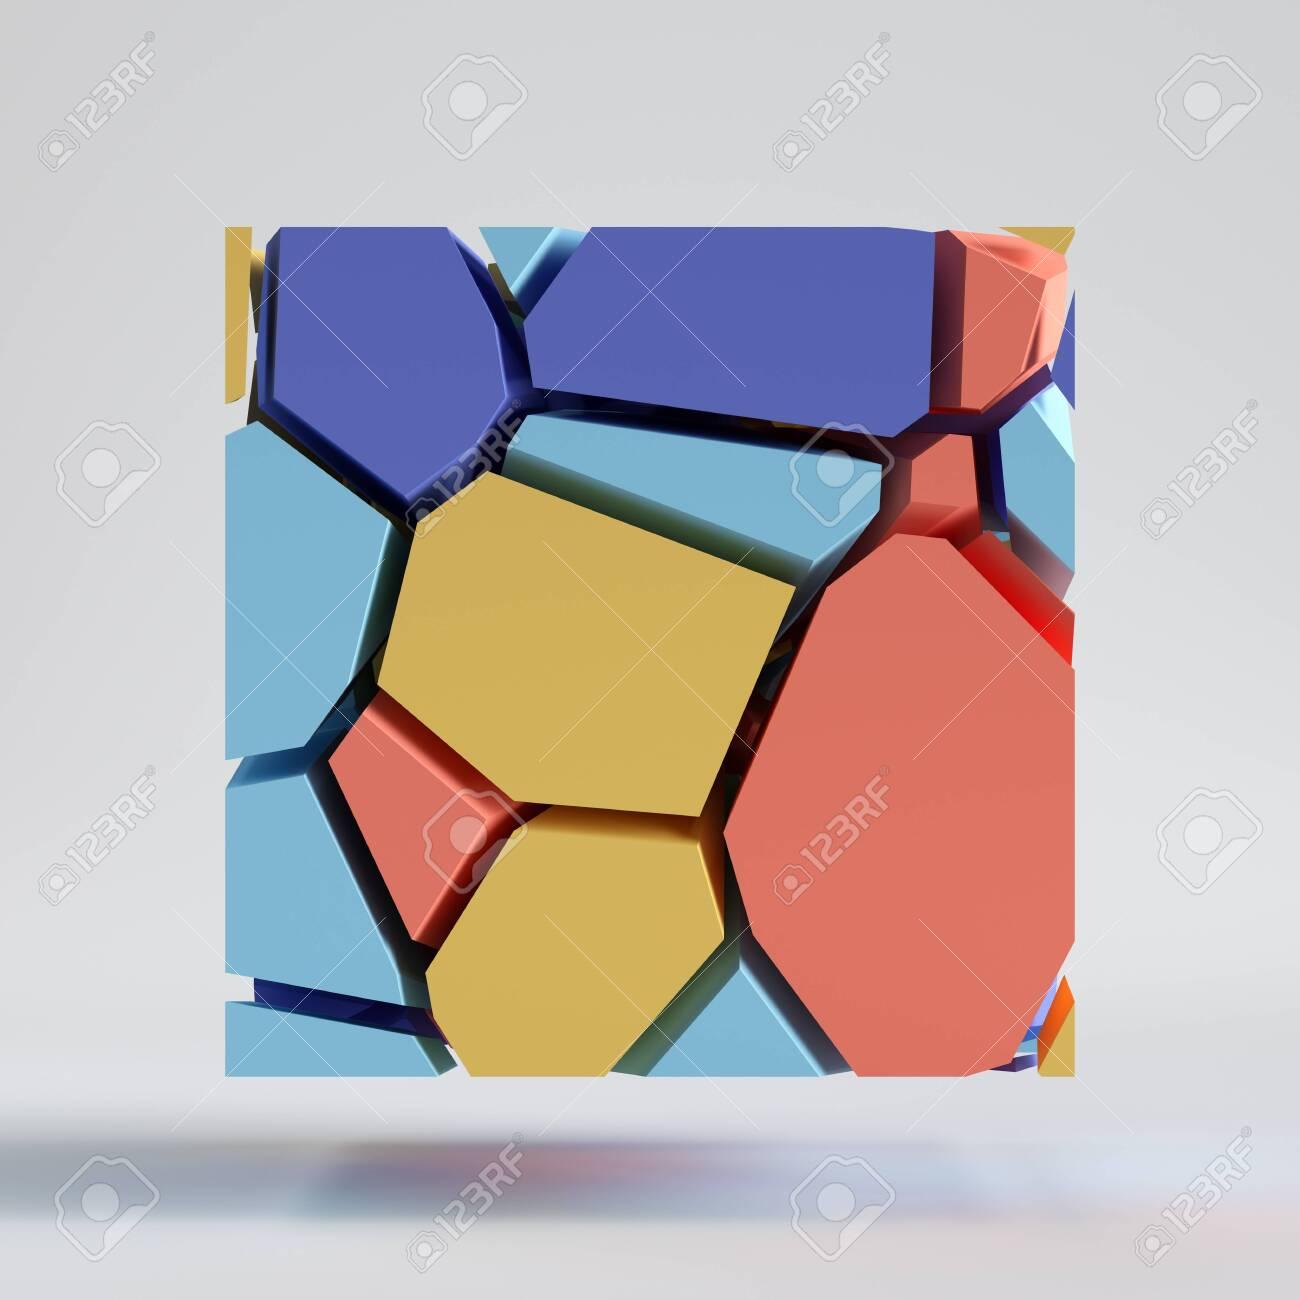 3d render abstract colorful random mosaic tile cut pieces